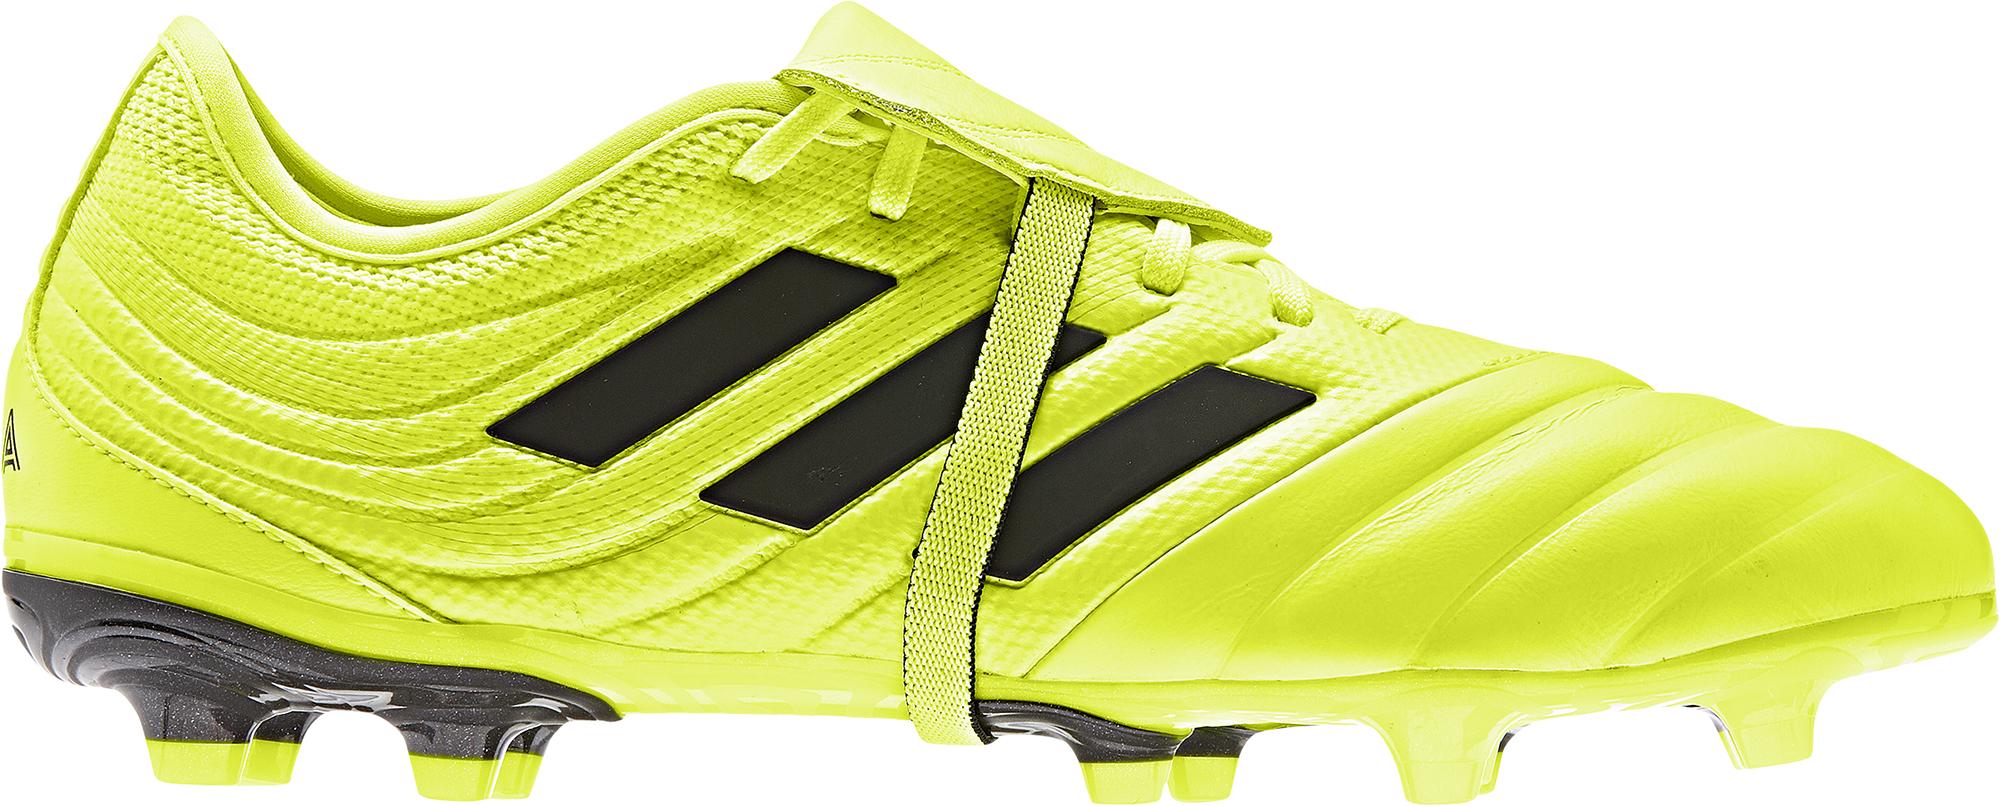 Adidas Бутсы мужские Copa 19.2 FG Gloro, размер 40,5